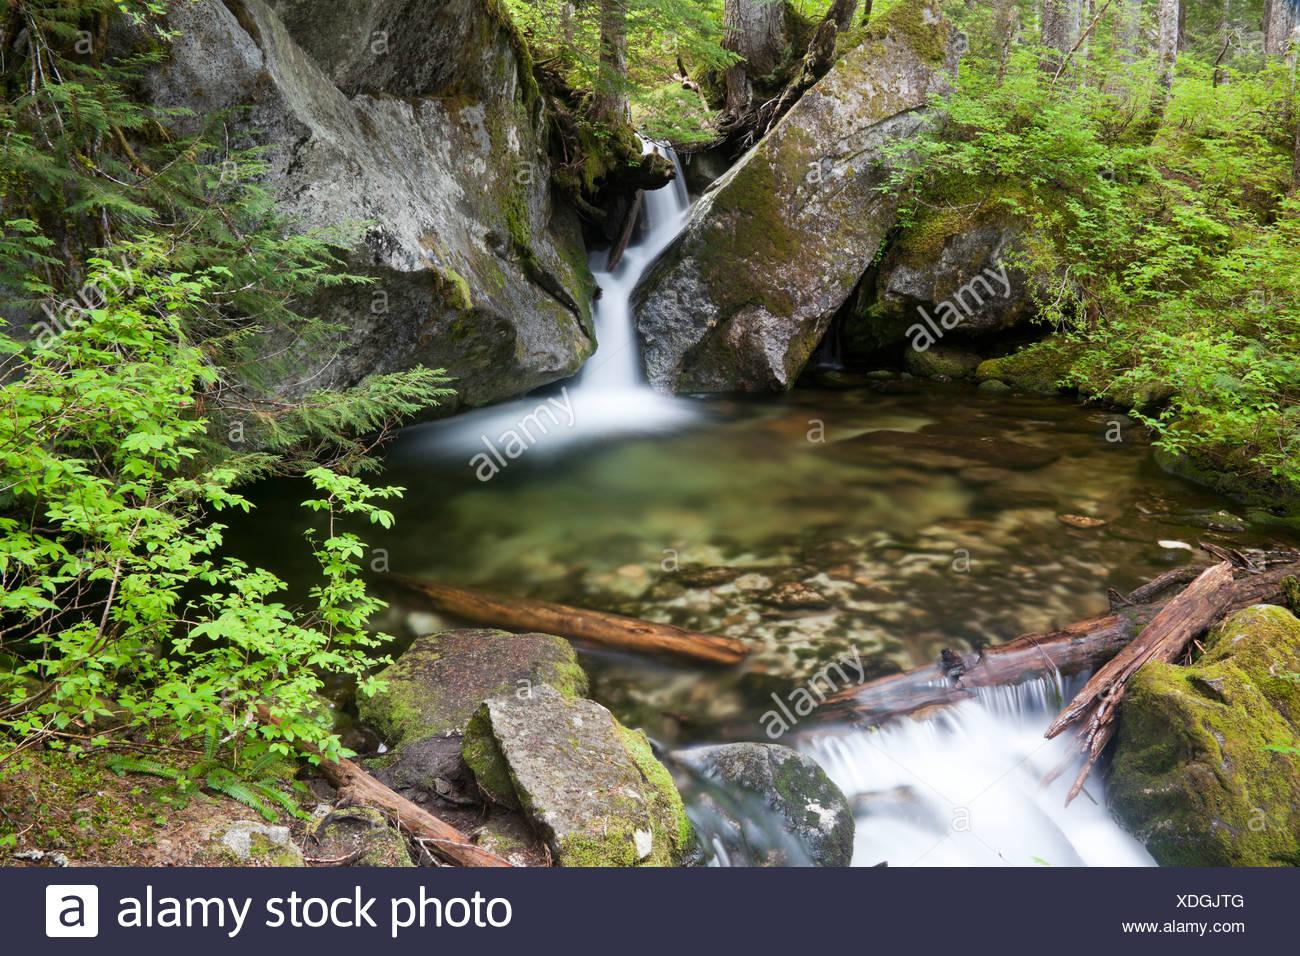 A rainforest stream cascades into a pool through granite rocks. - Stock Image